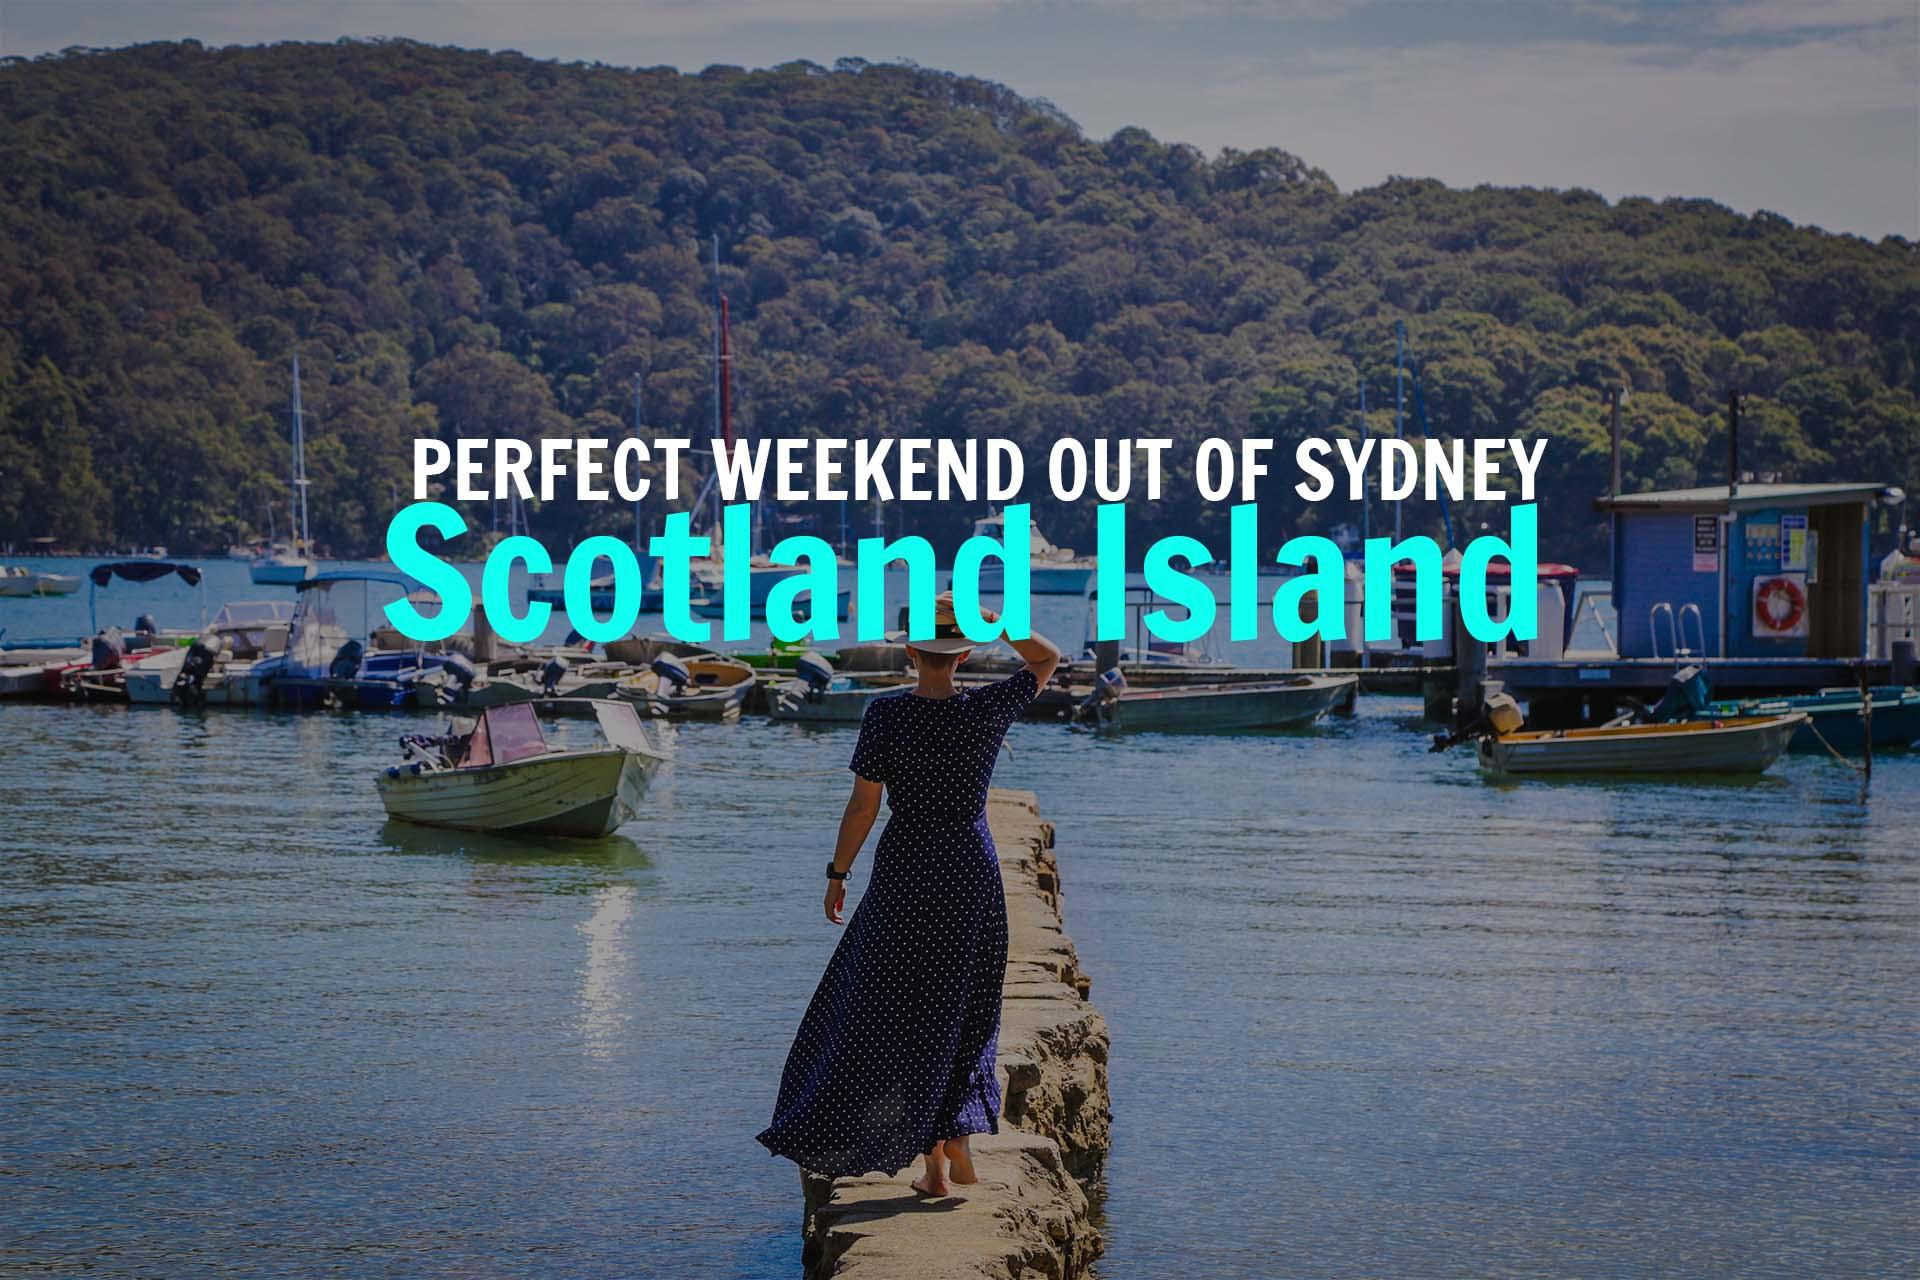 Scotland-Island-lodge-sydney